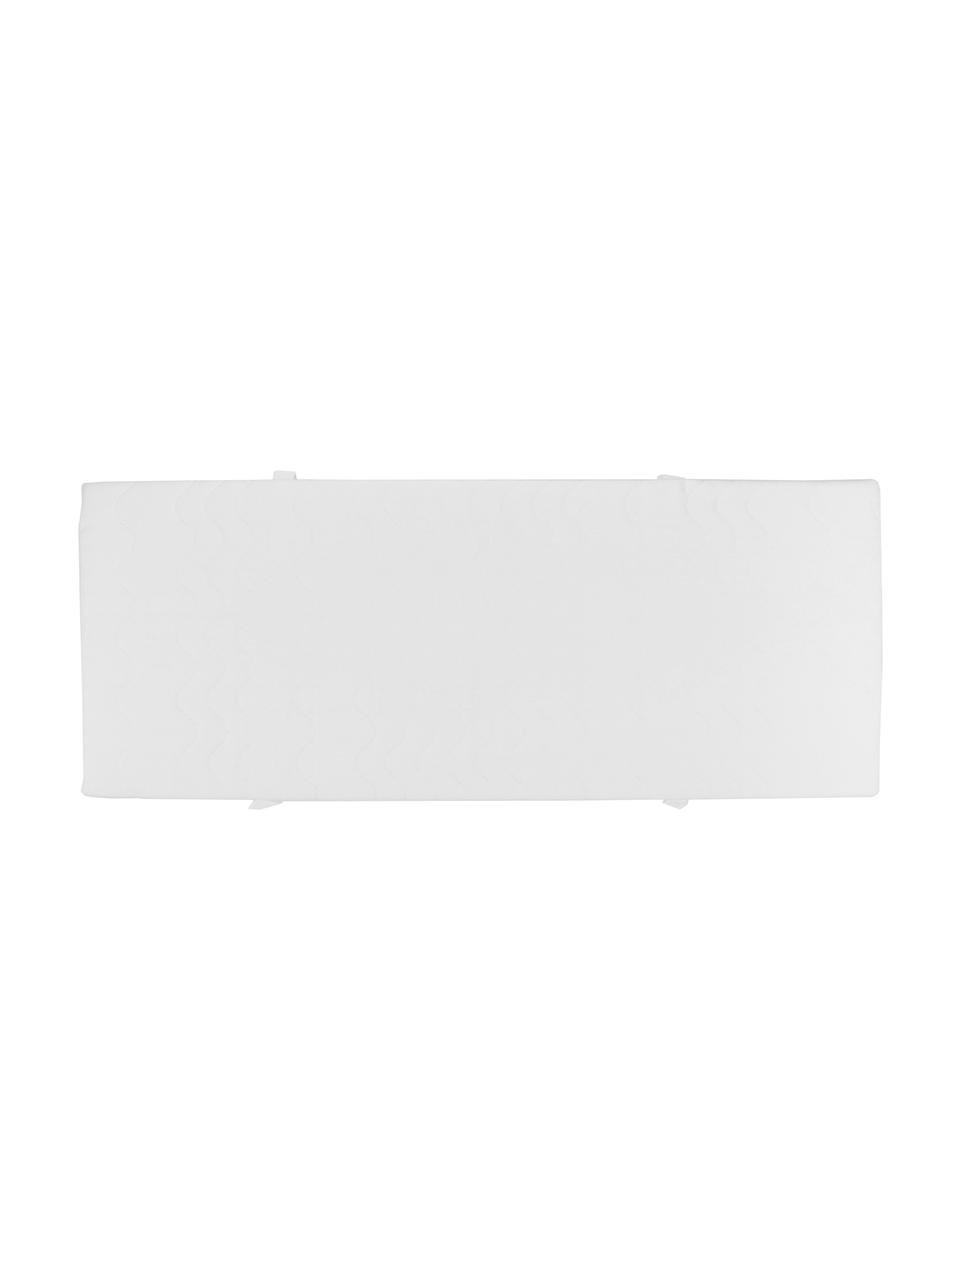 7-Zonen-Kaltschaummatratze Vital, Bezug: Doppeljersey-TENCEL® (56%, Weiß, 160 x 200 cm